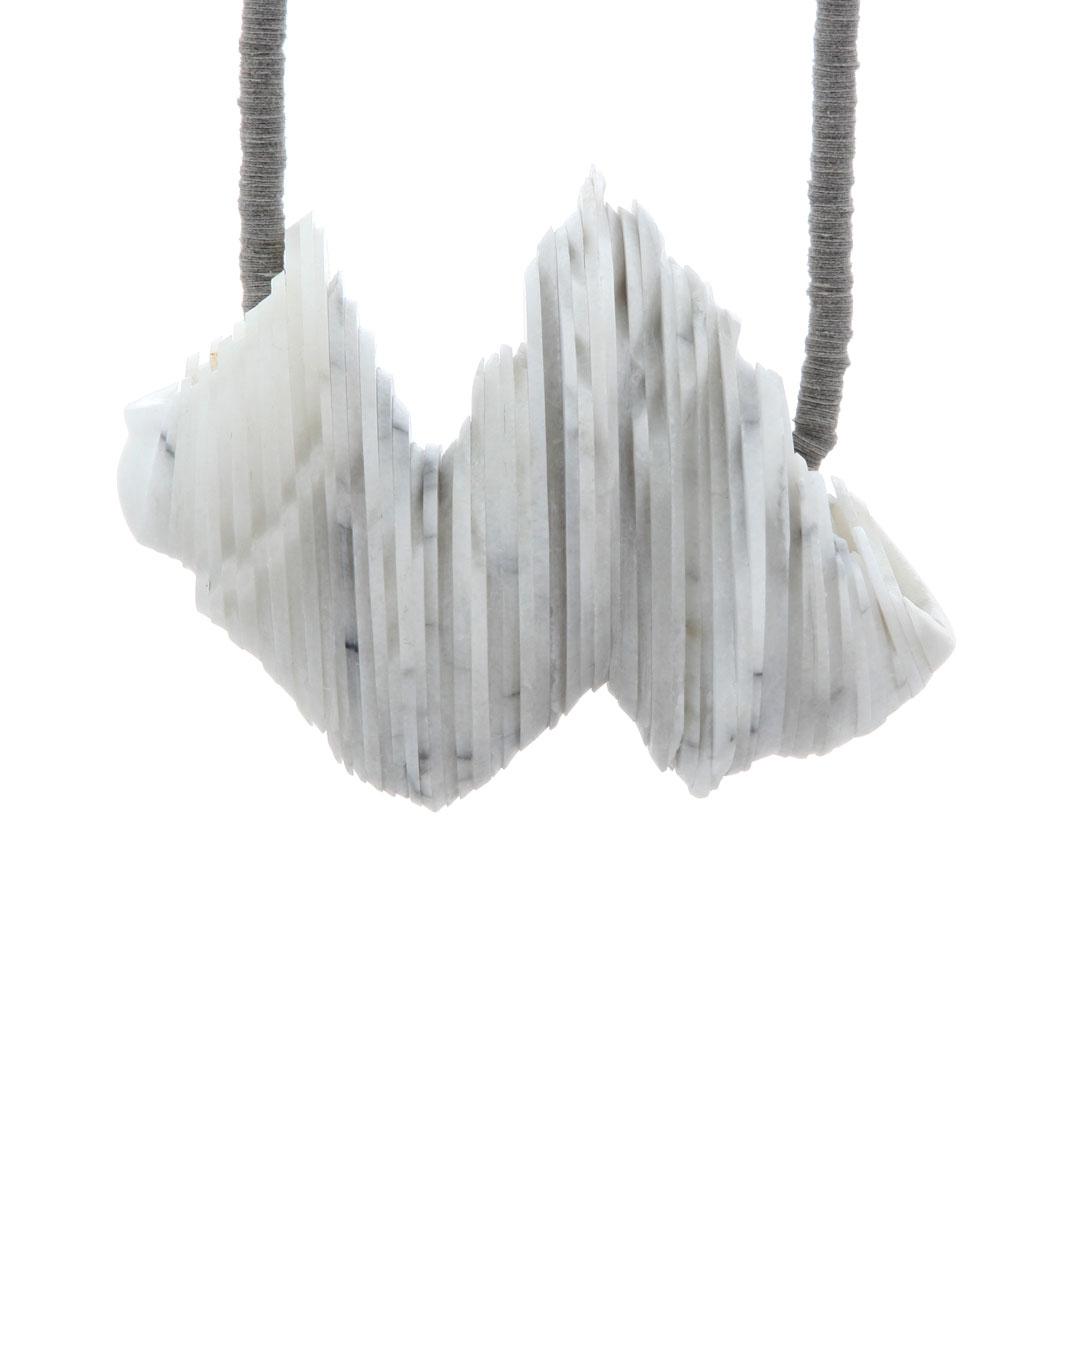 Tarja Tuupanen, untitled, 2015, necklace; ready-made marble tableware, velour sticker, steel wire, brass, 450 x 120 x 45 mm, €1700